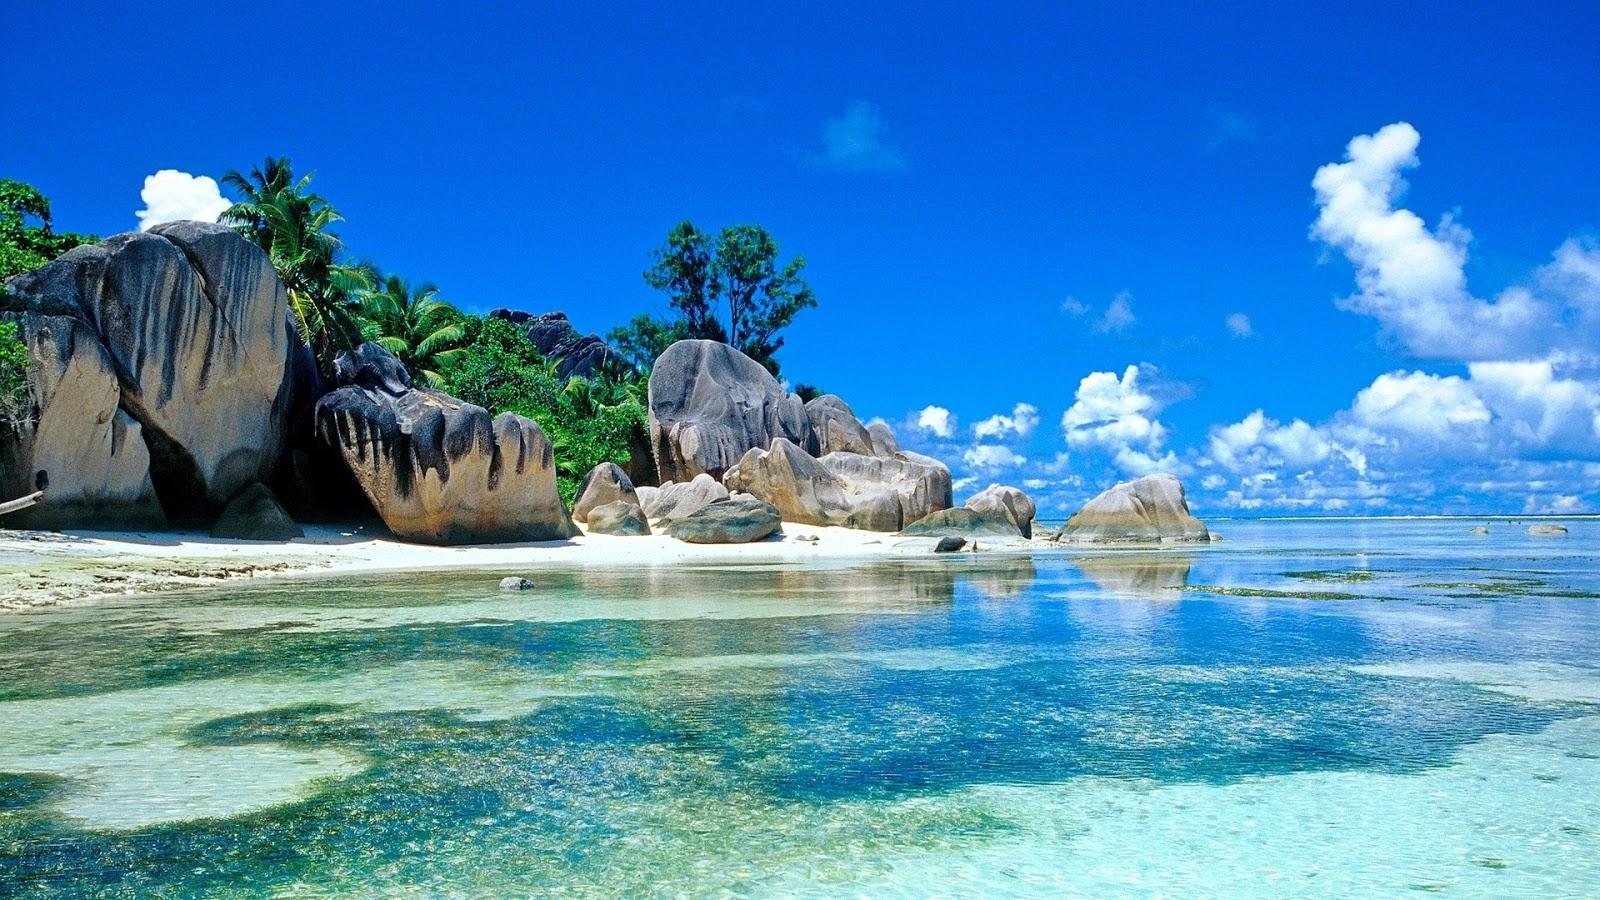 paradise_island-1080.jpg